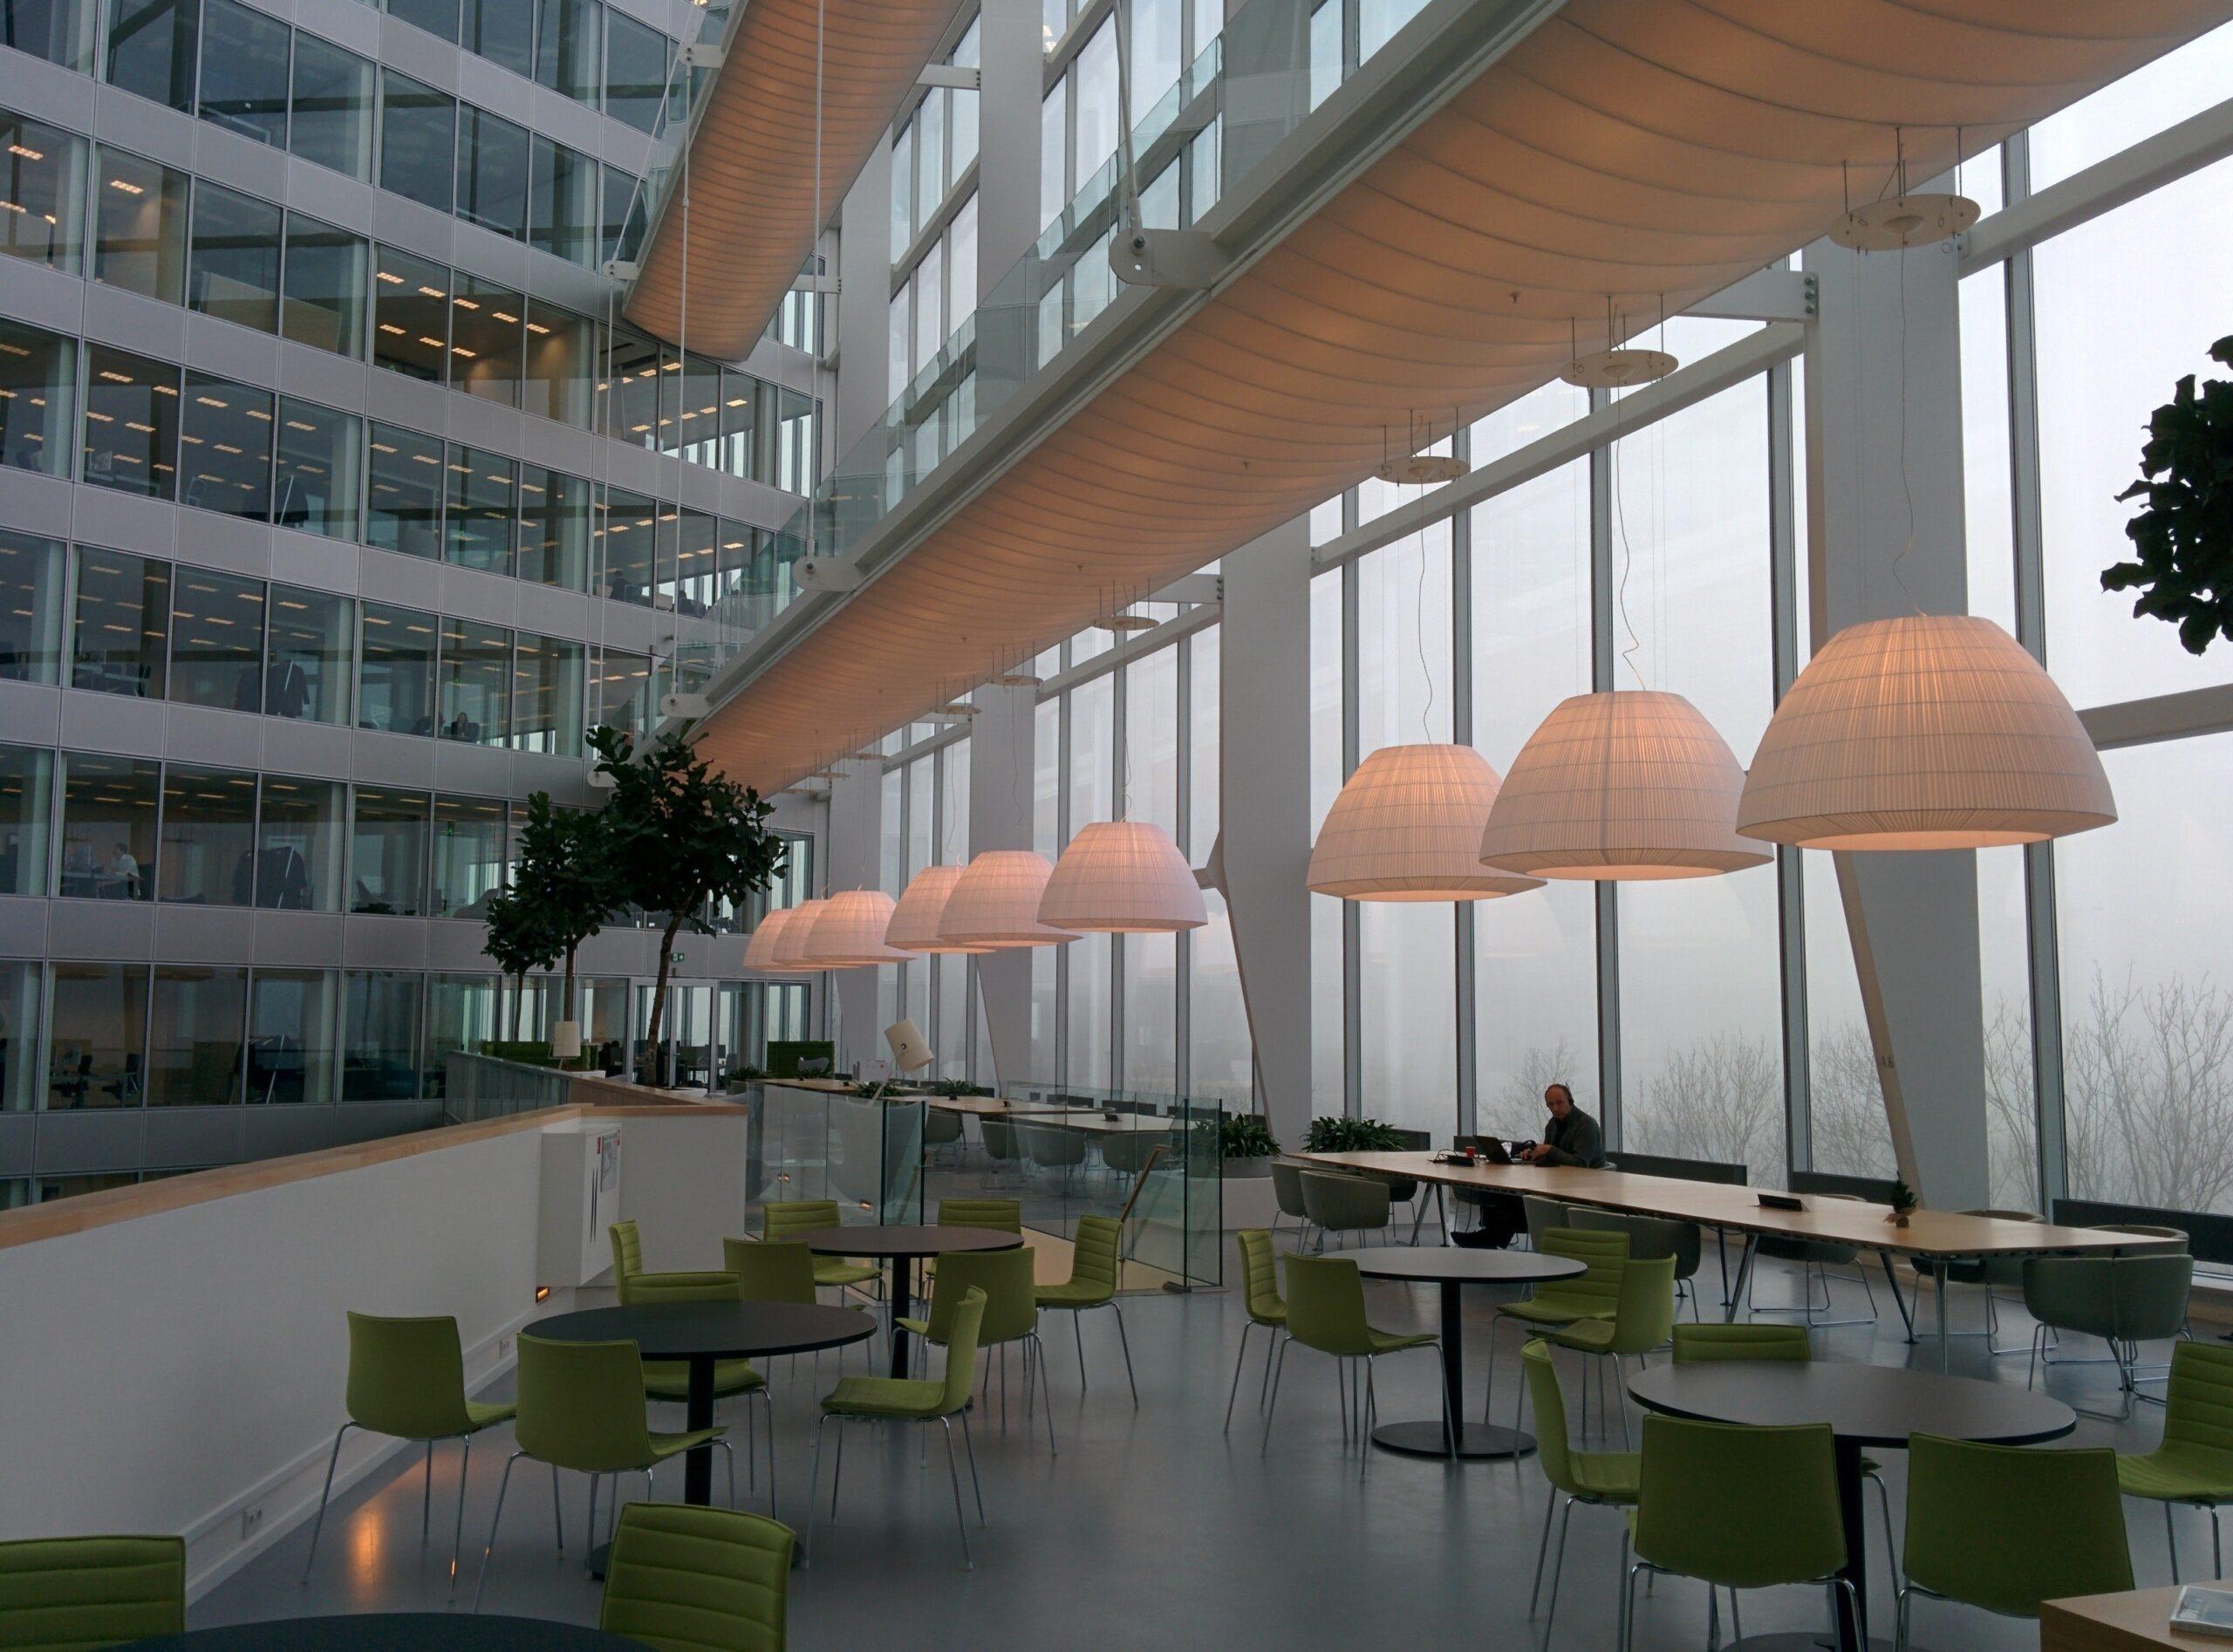 Info om polycarbonatplader og facadesystemer fra firmaet Mogens Rasmussen